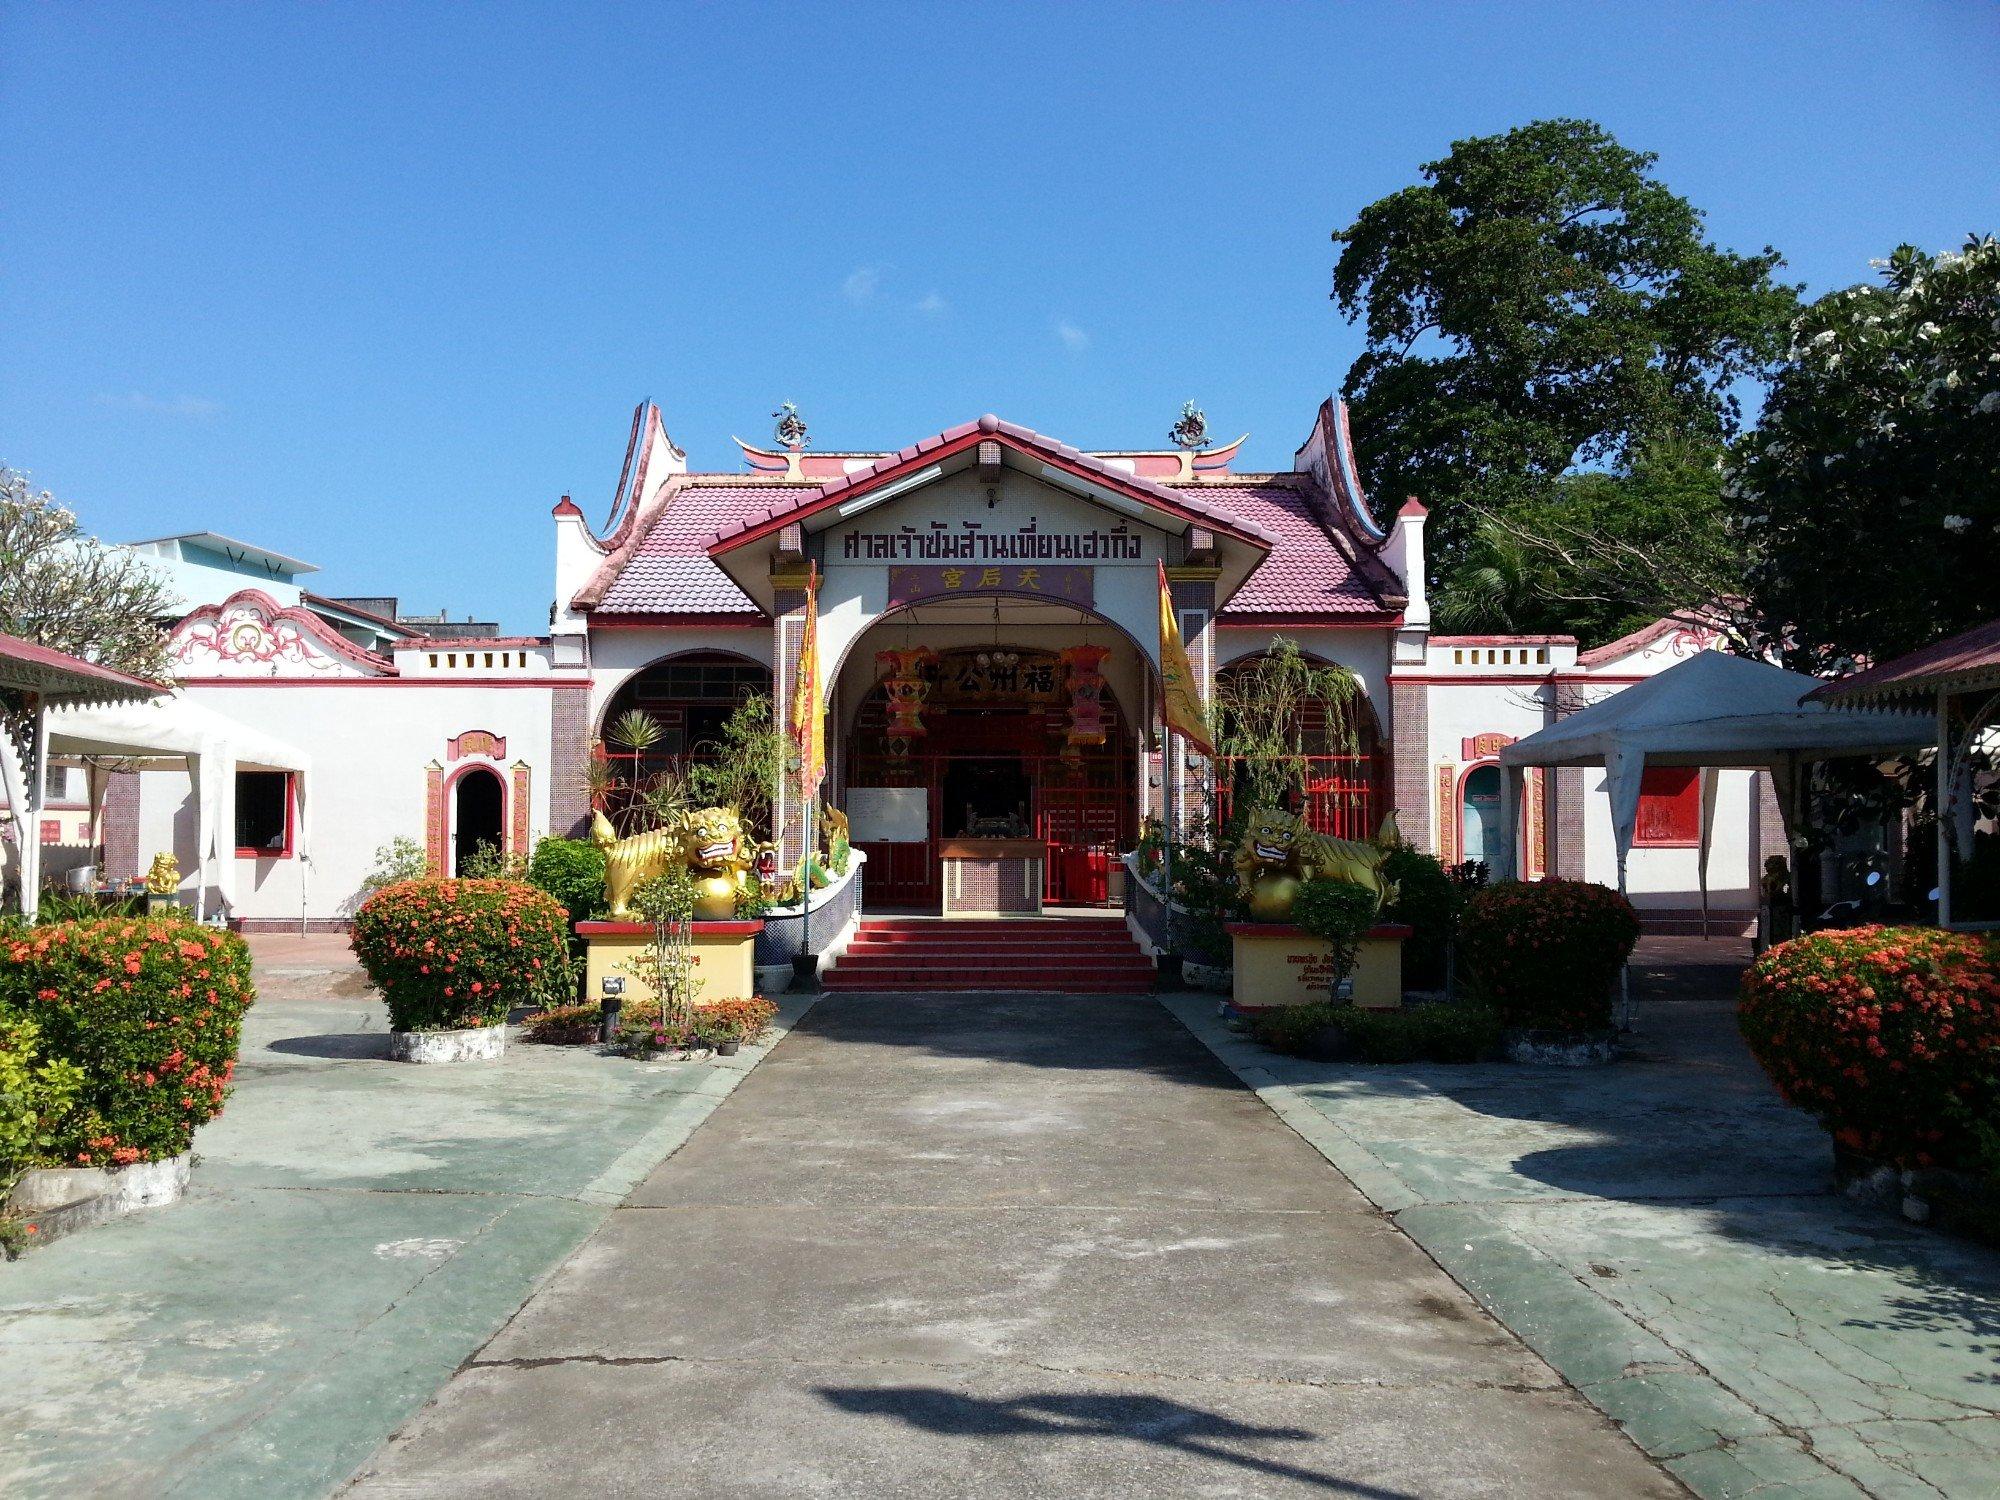 Building housing the Chaomae Ya Nang Shrine